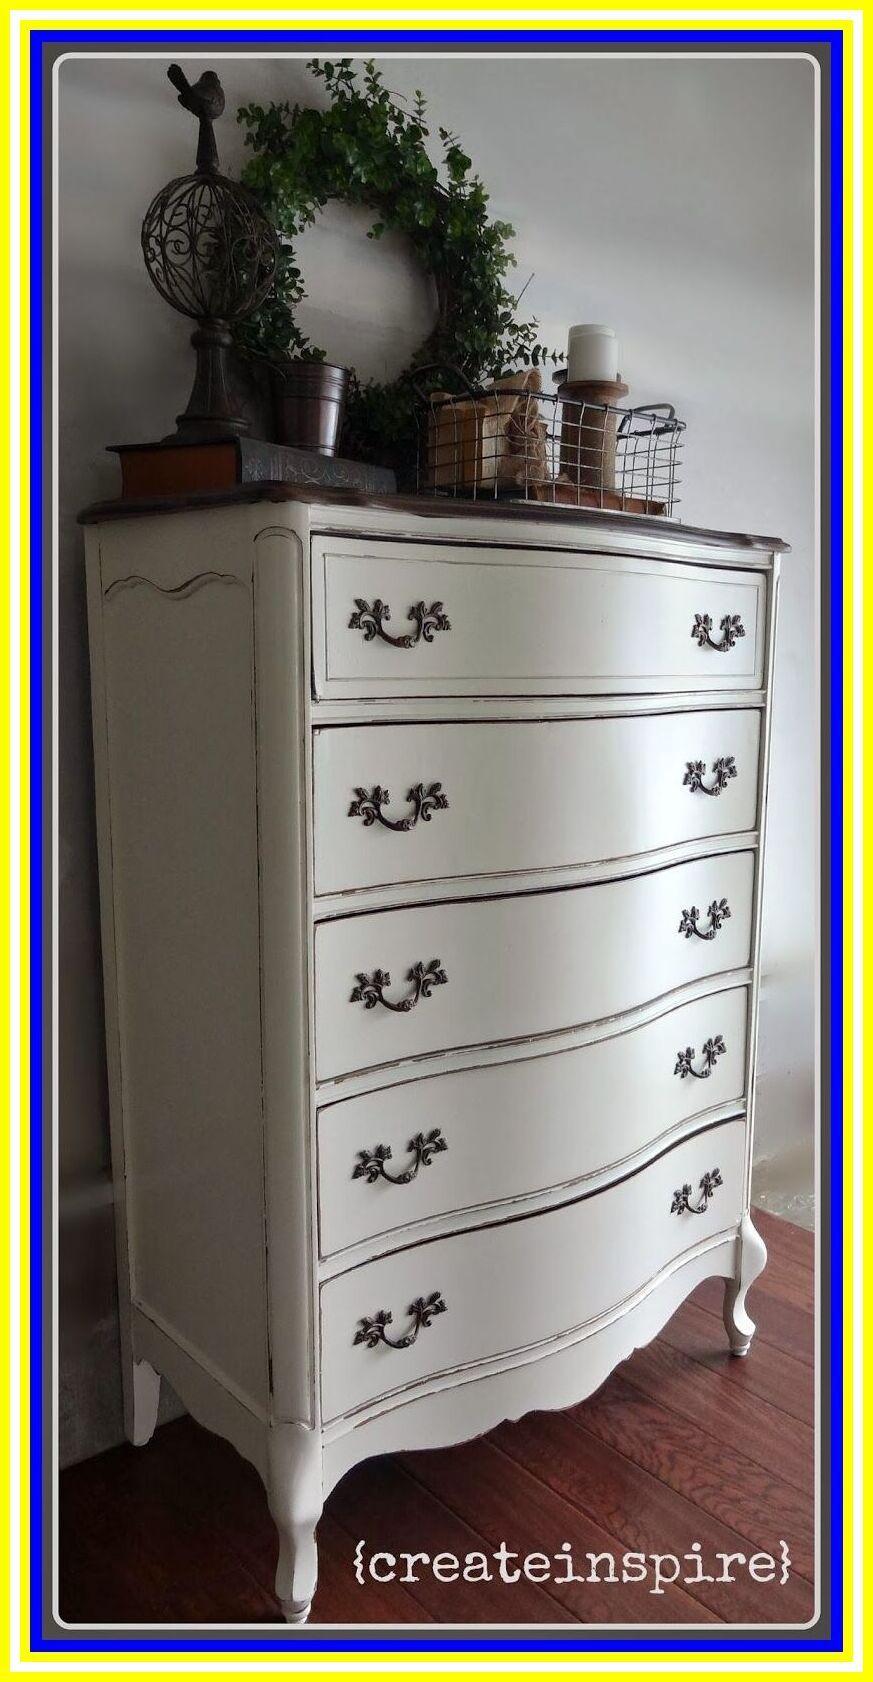 119 Reference Of Antique White Dresser Bedroom Furniture In 2020 Antique White Furniture French Provincial Bedroom Furniture Antique White Bedroom Furniture